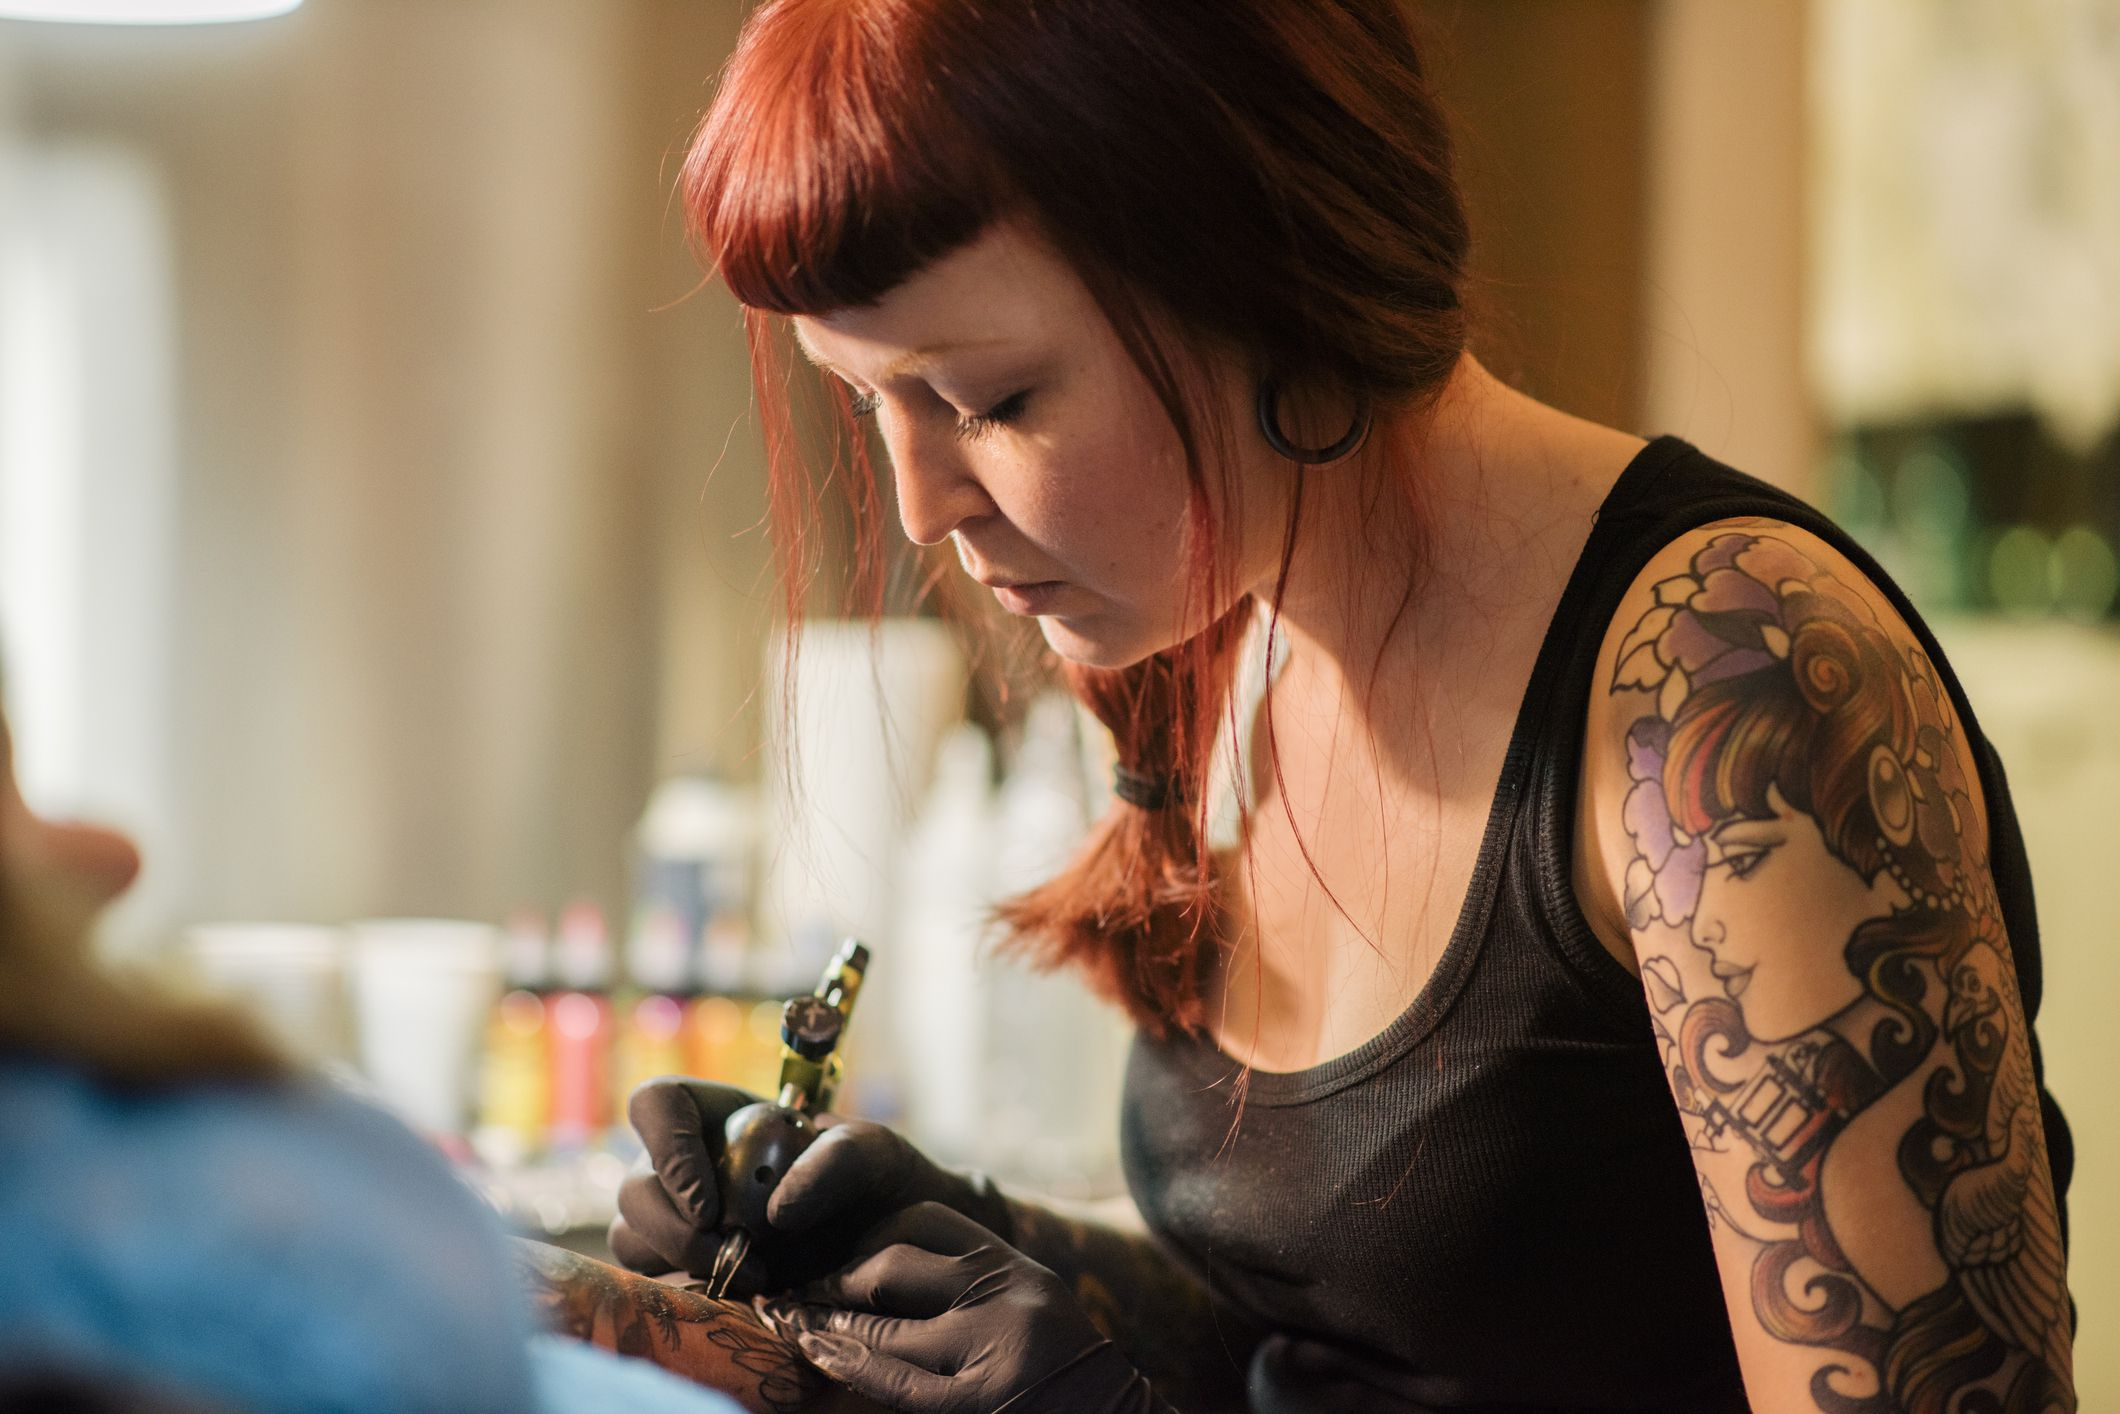 Are tattoos addictive for Are tattoos addictive